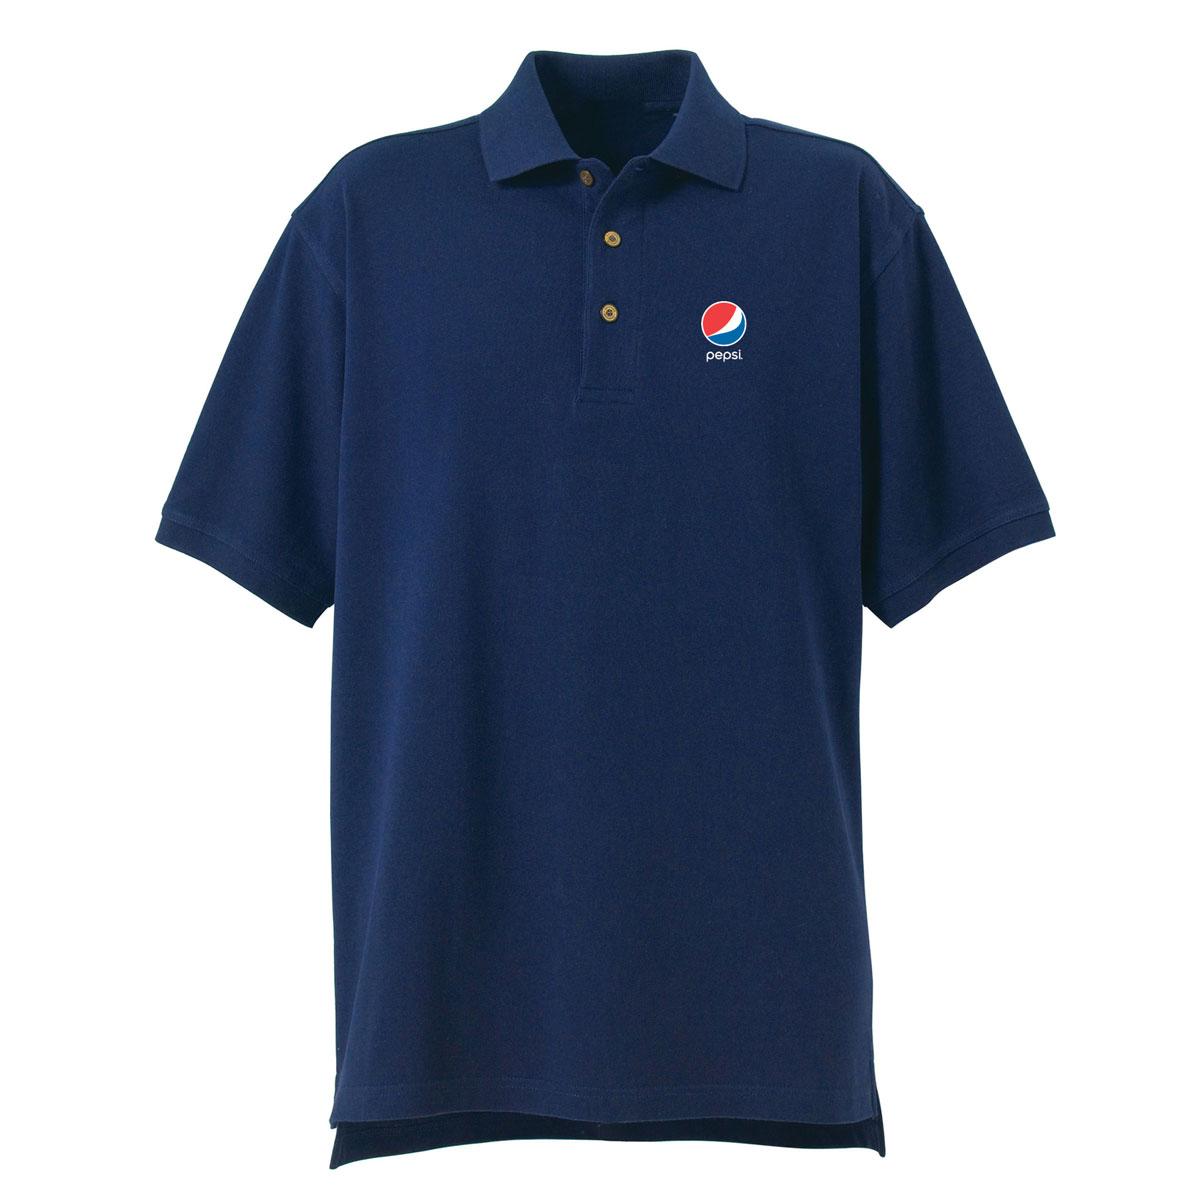 vox11 nike mens golf shirts sale